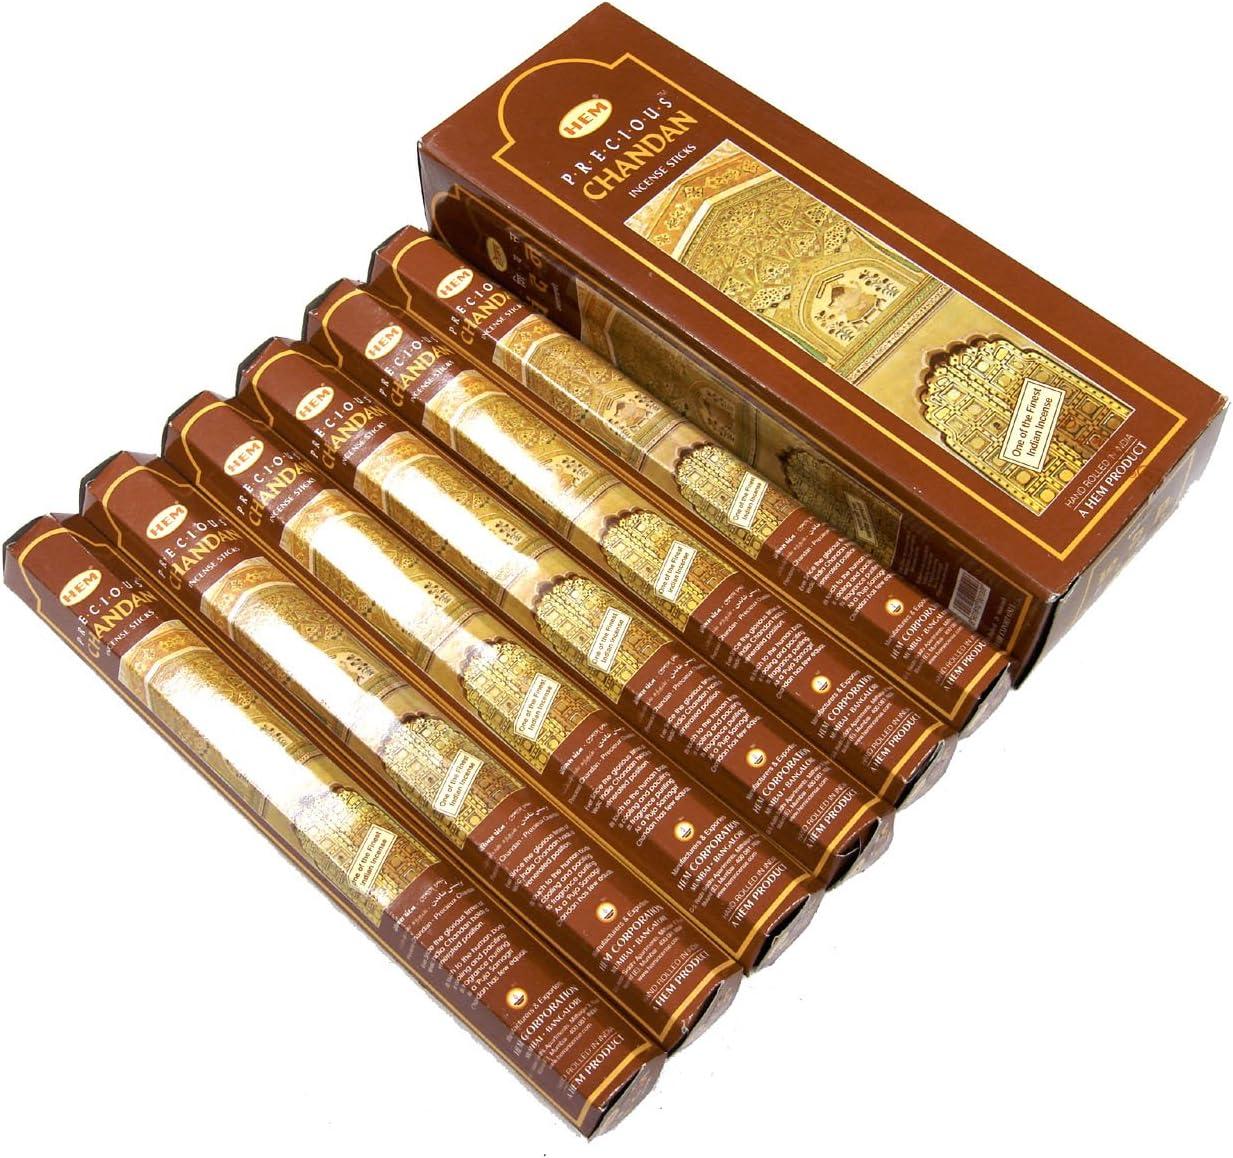 Hem Precious Chandan Incense Nippon regular agency Sticks of 120-Count Pack Sandal Discount is also underway